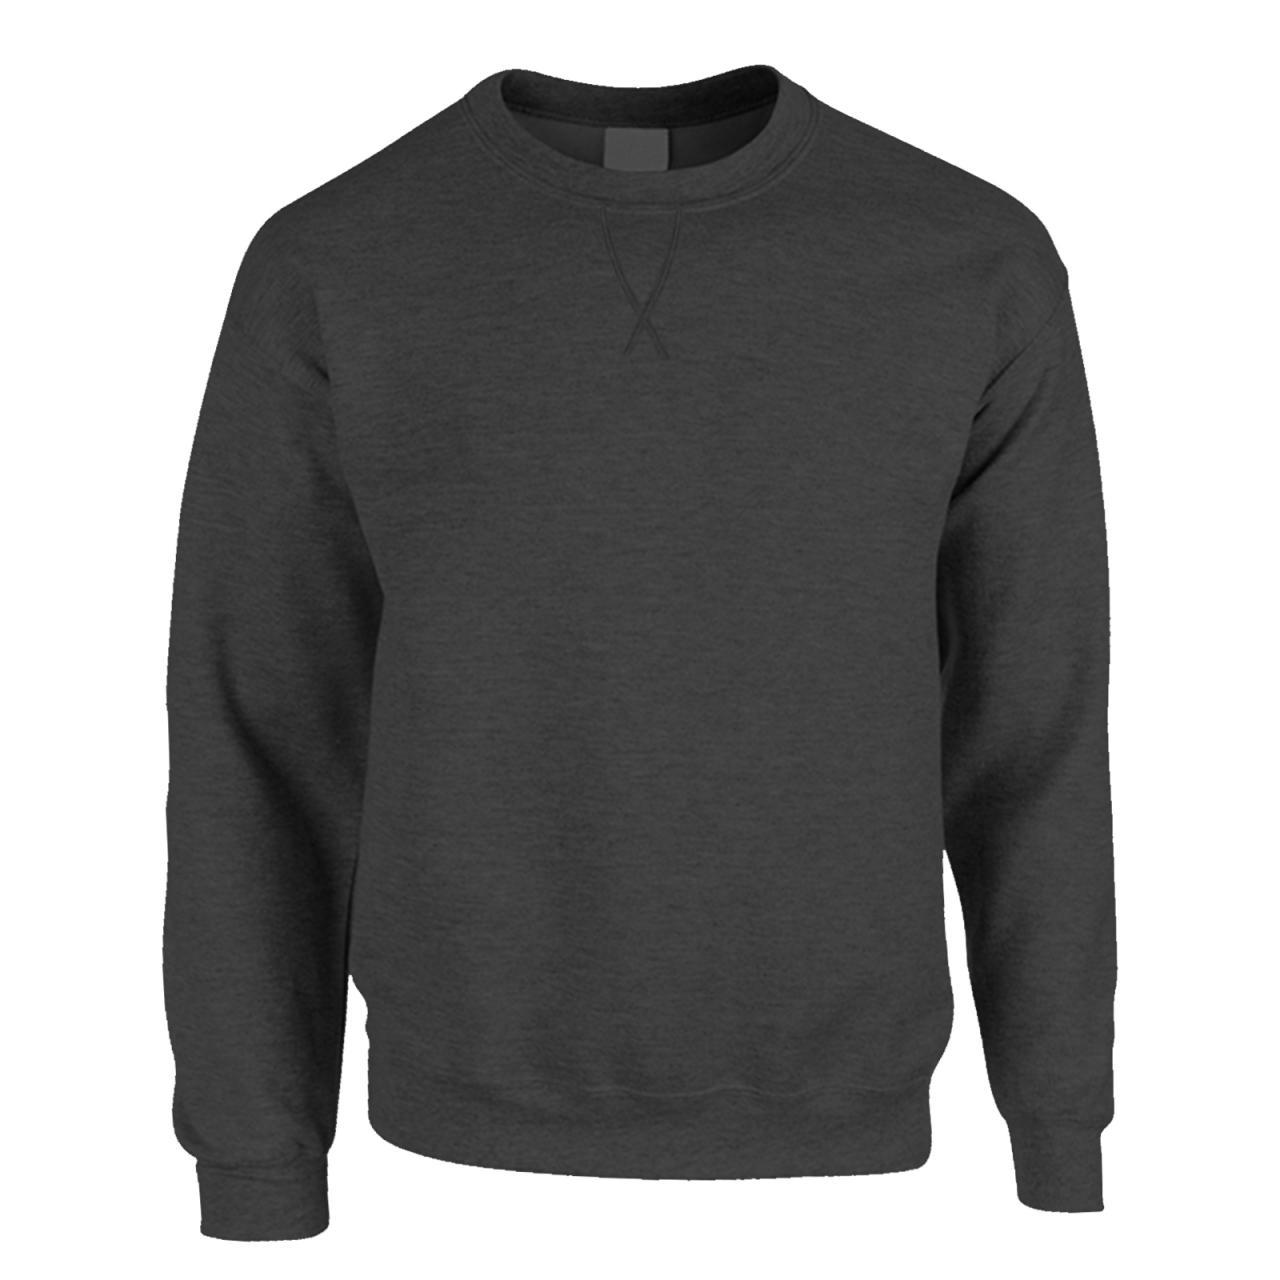 New-Mens-Casual-Long-Sleeve-Classic-Plain-Pullover-Sweatshirt-Jumper-Sweater-Top